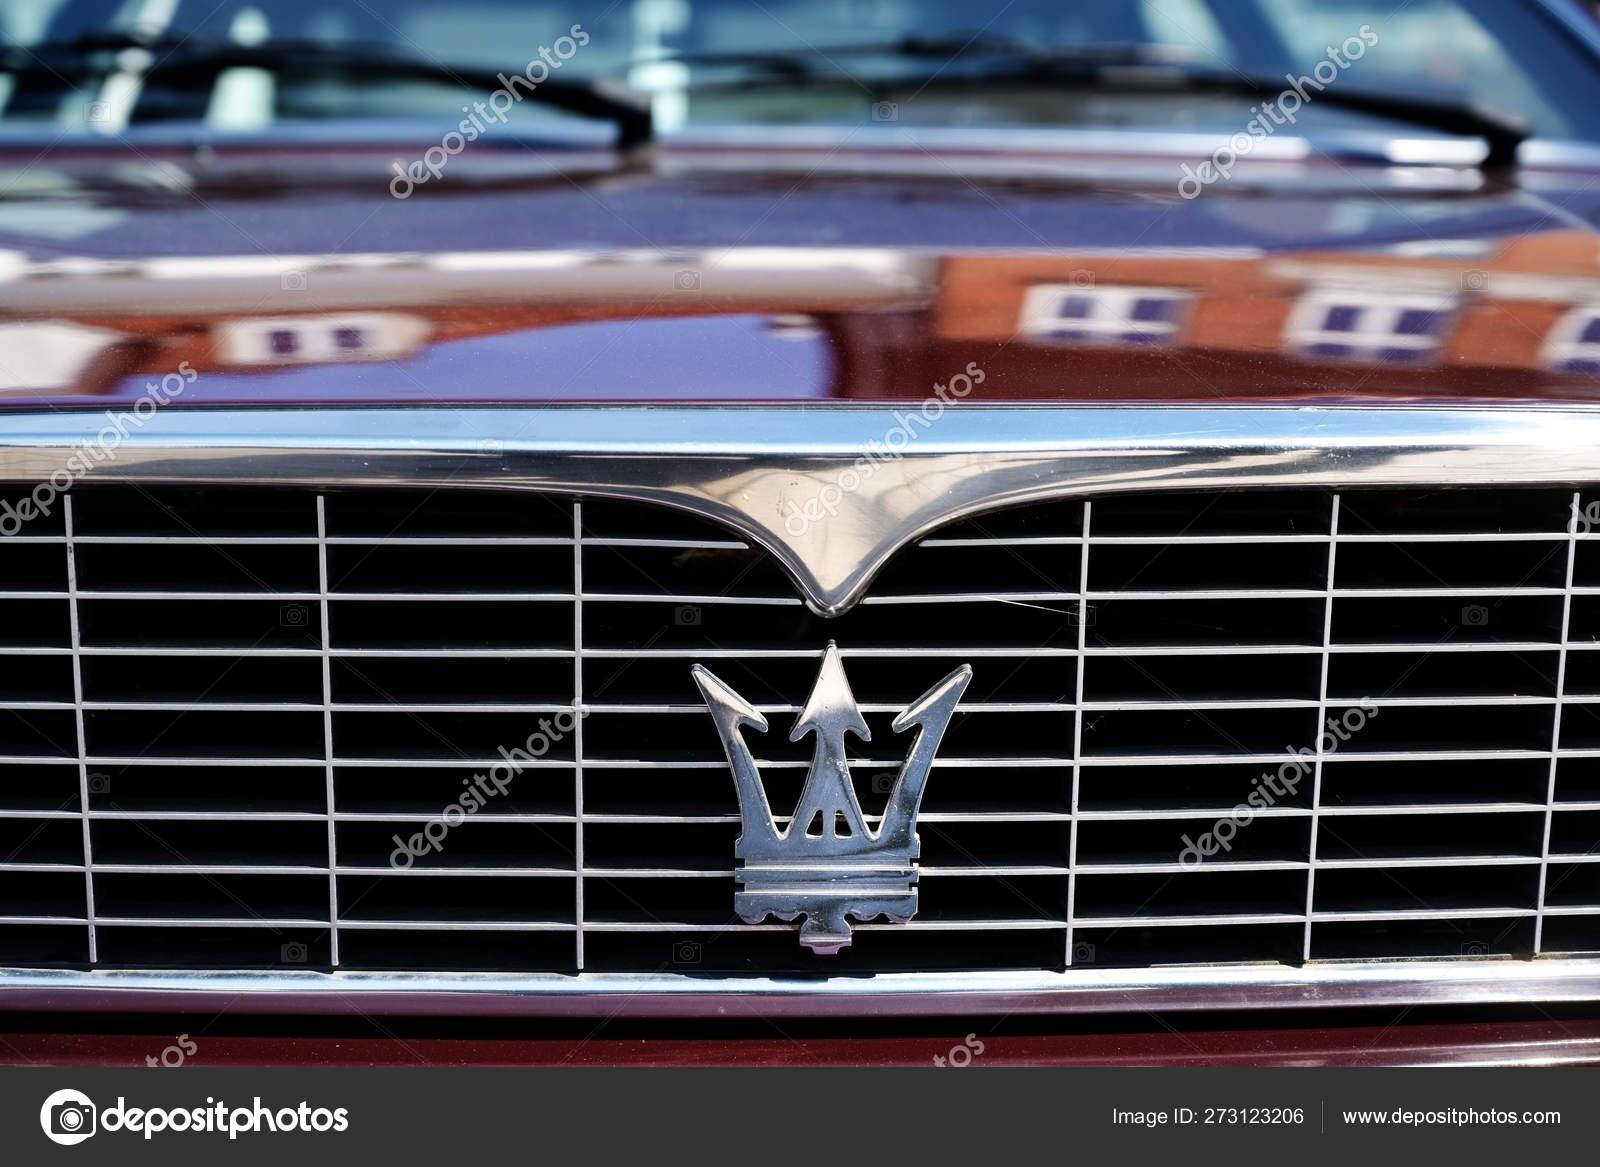 Trident Car Logo >> Ratzeburg Germany June 2 2019 Maserati Grille With Trident